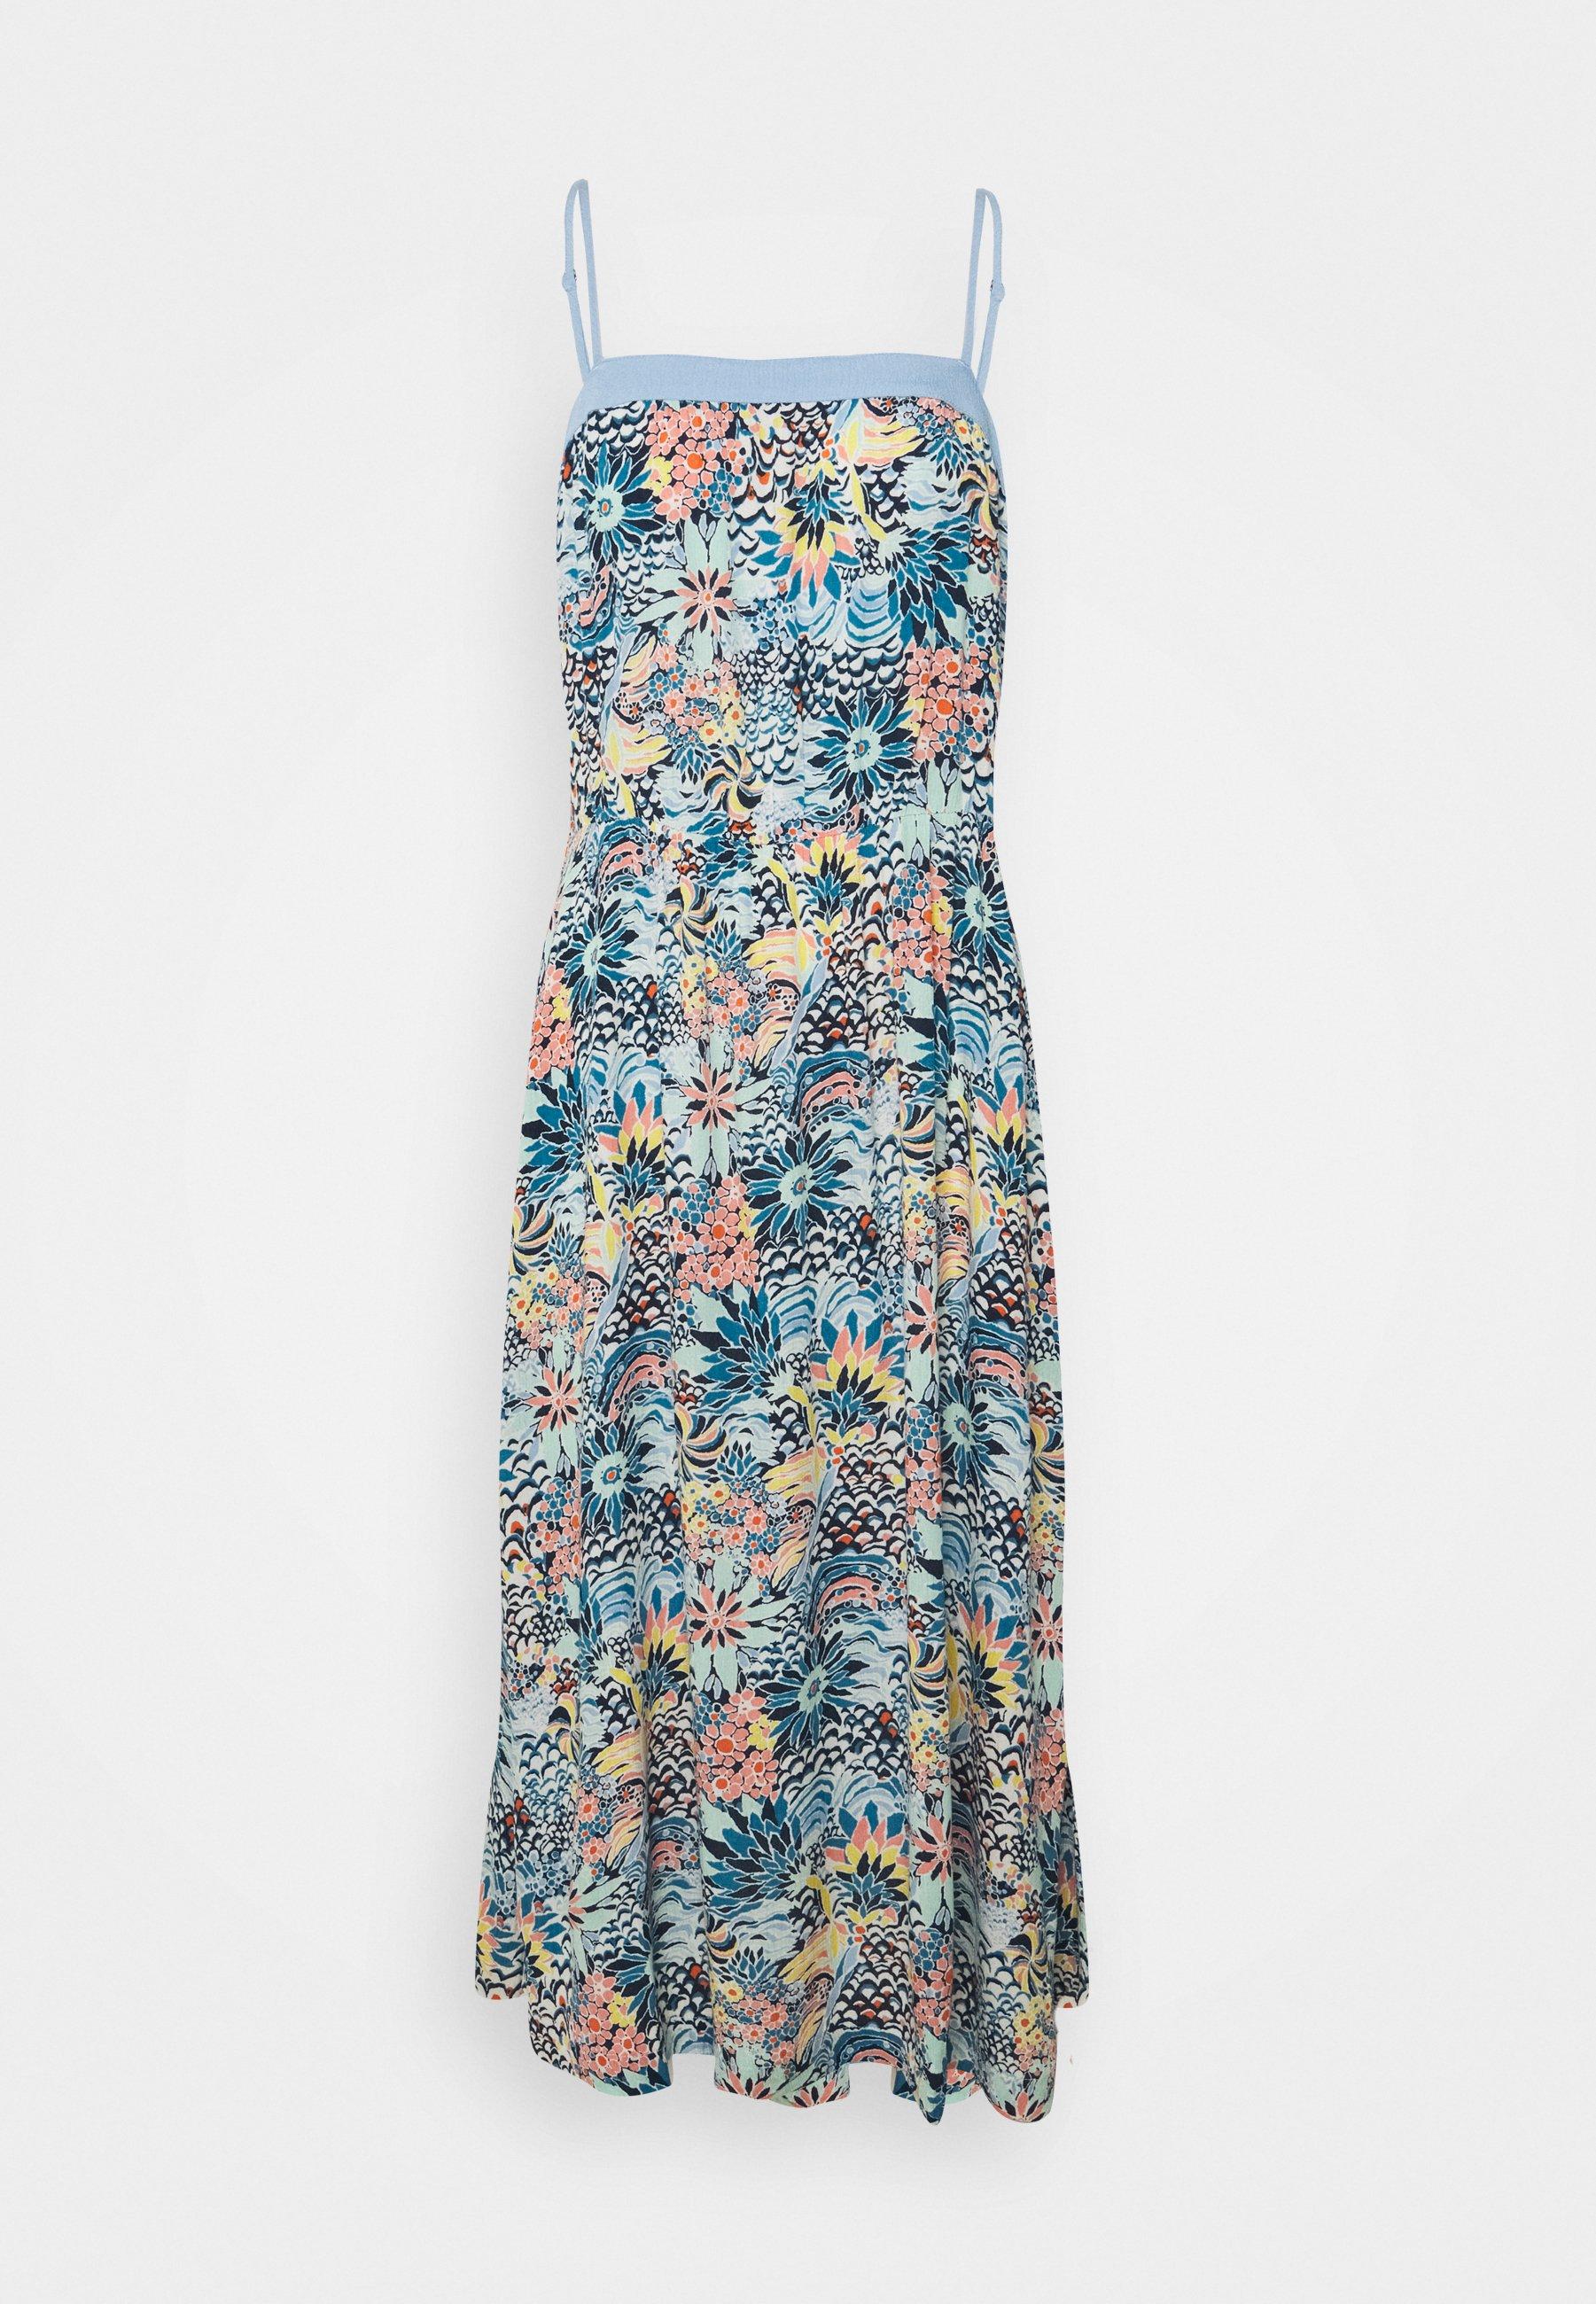 Women MARINE BLOOM MIDI DRESS - Day dress - powder puff flower